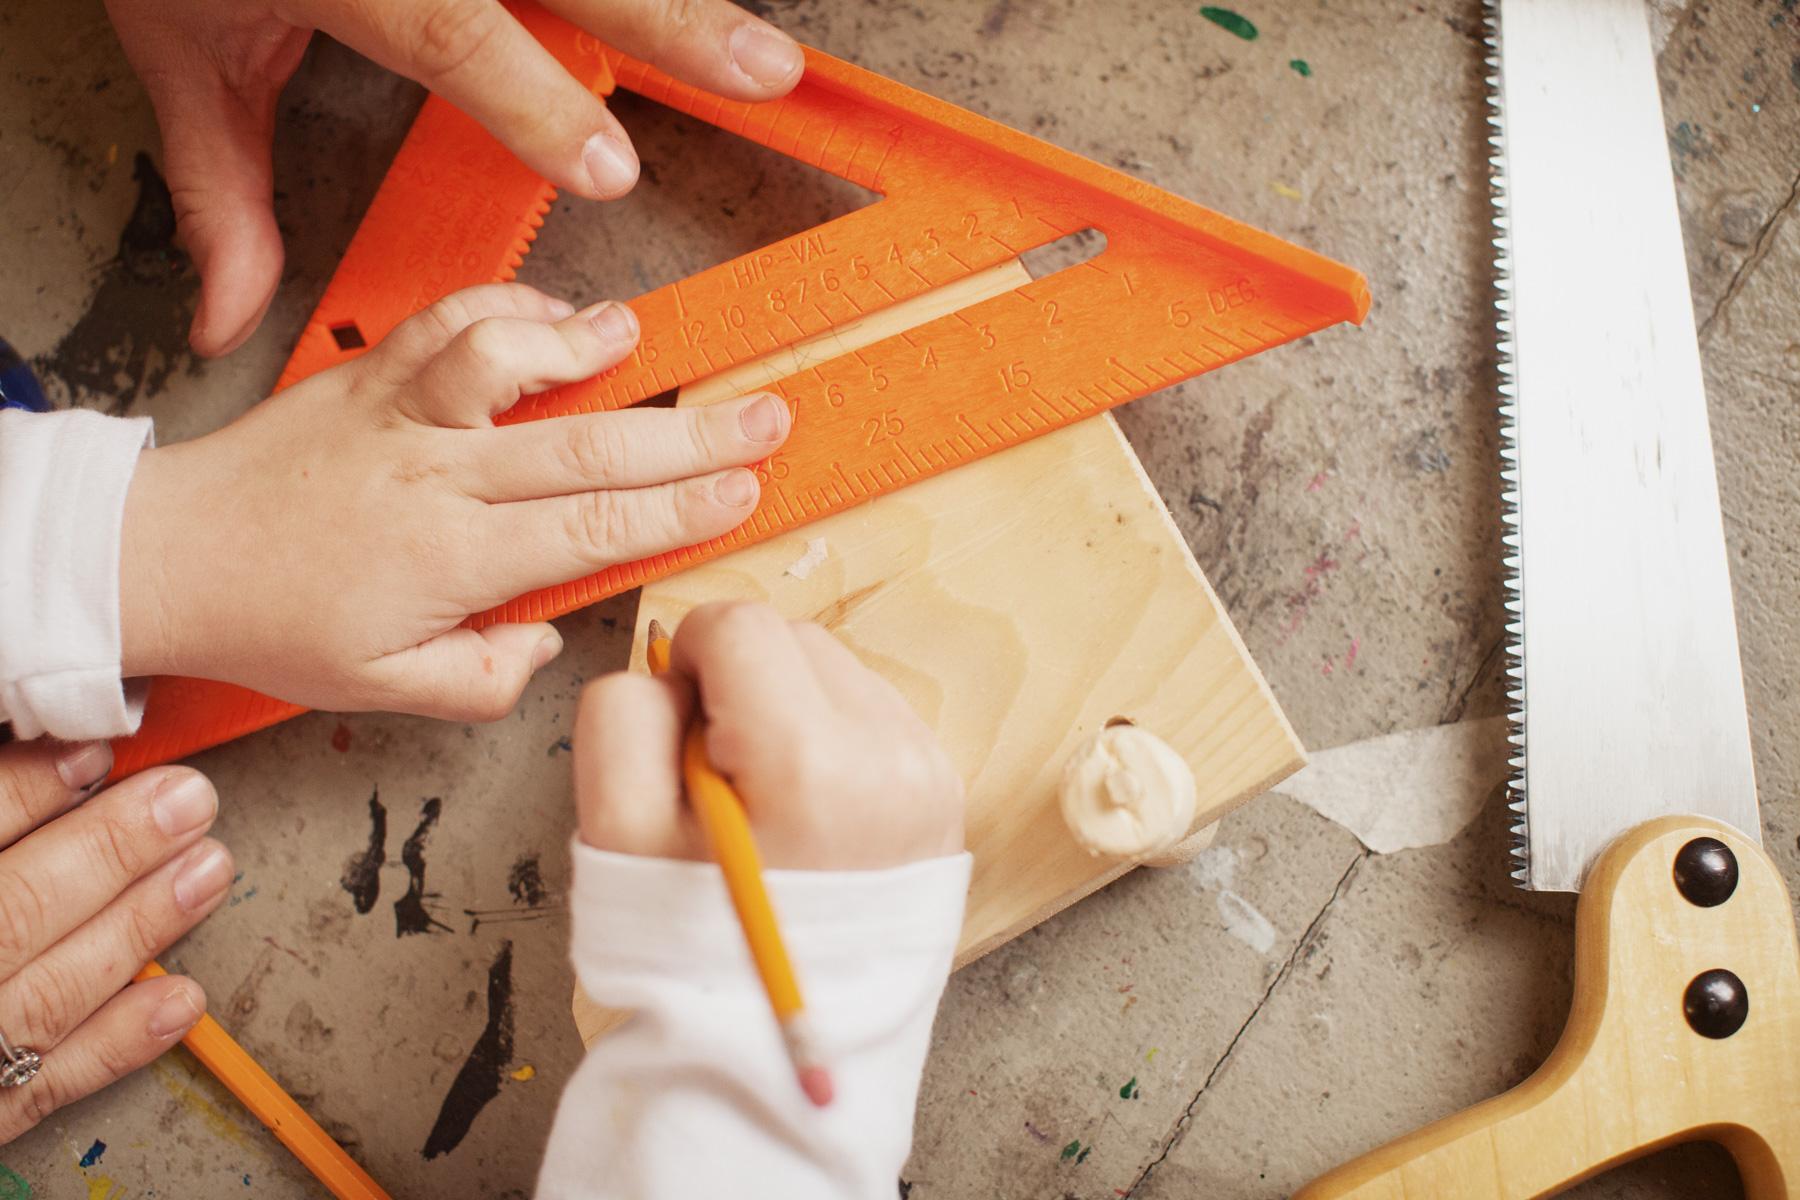 carpentry-kid-detail-1.jpg